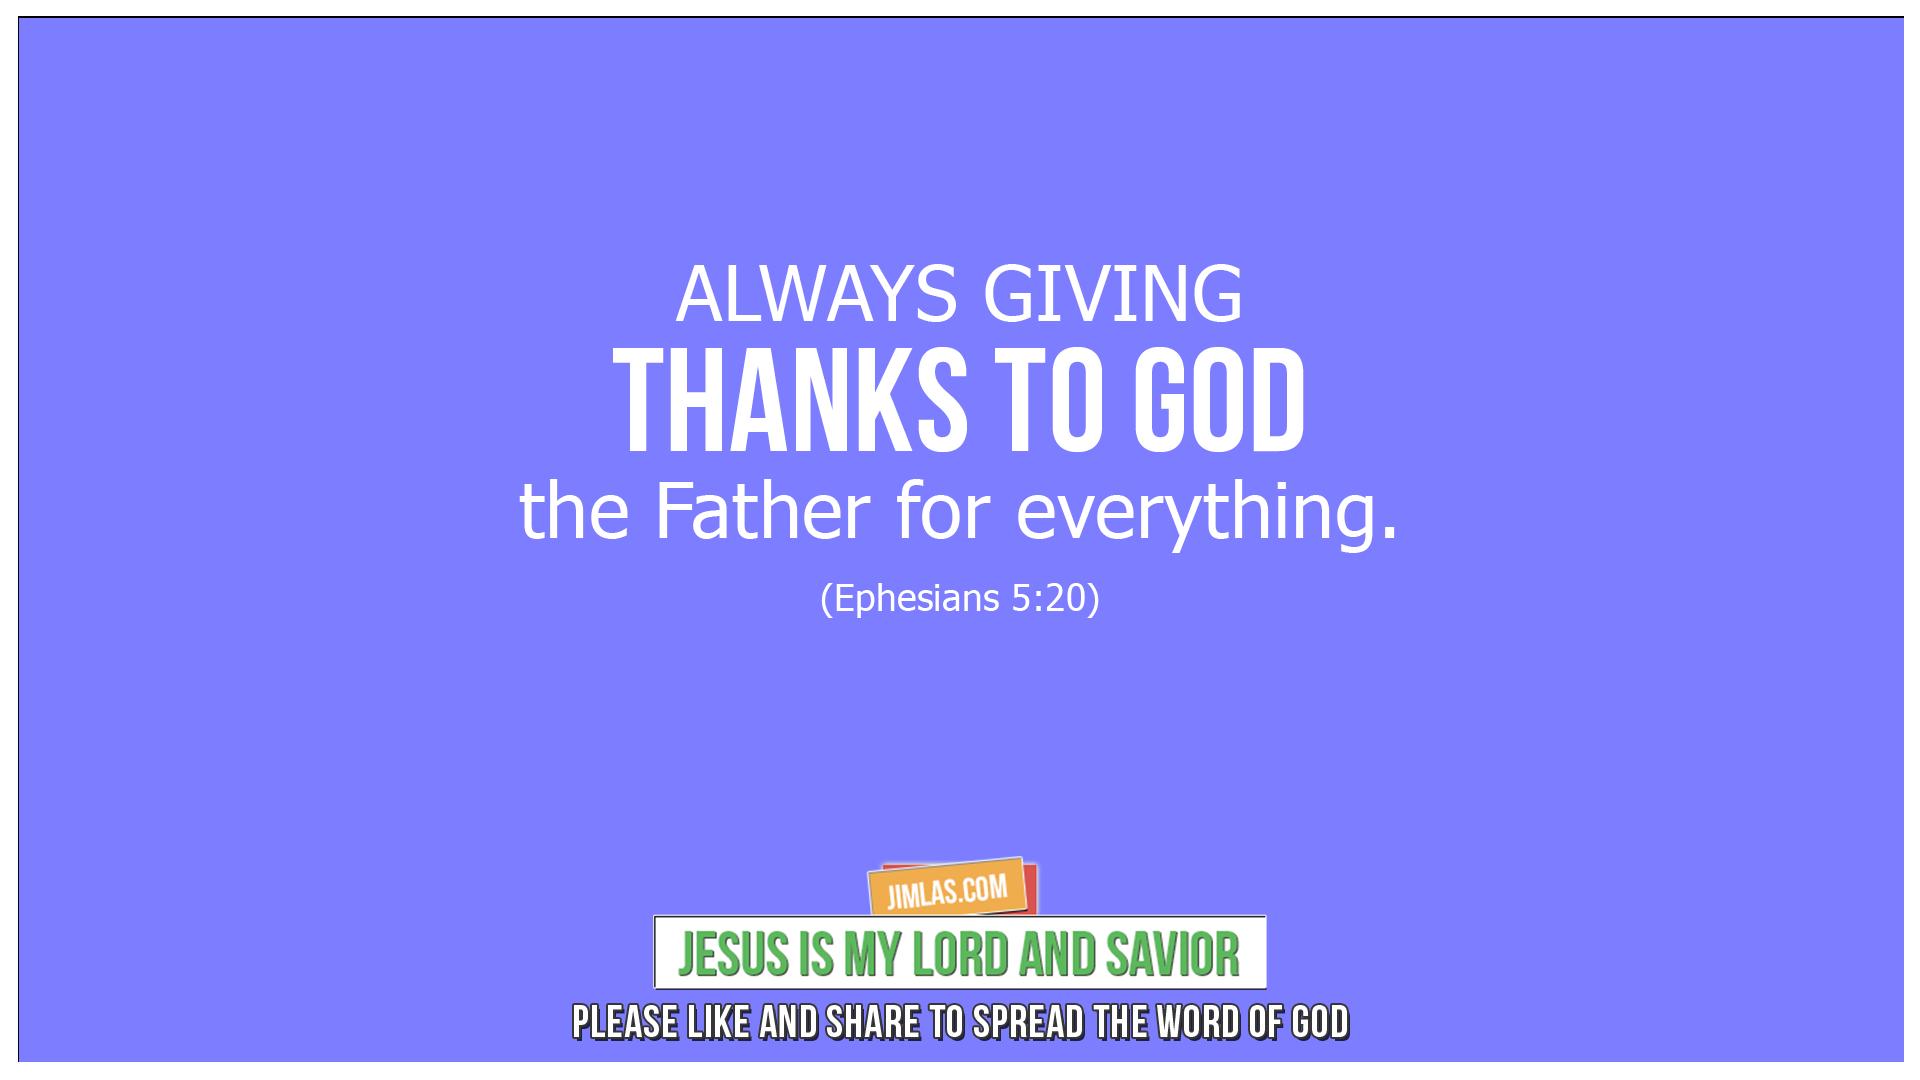 ephesians 5 20, Ephesians 5:20